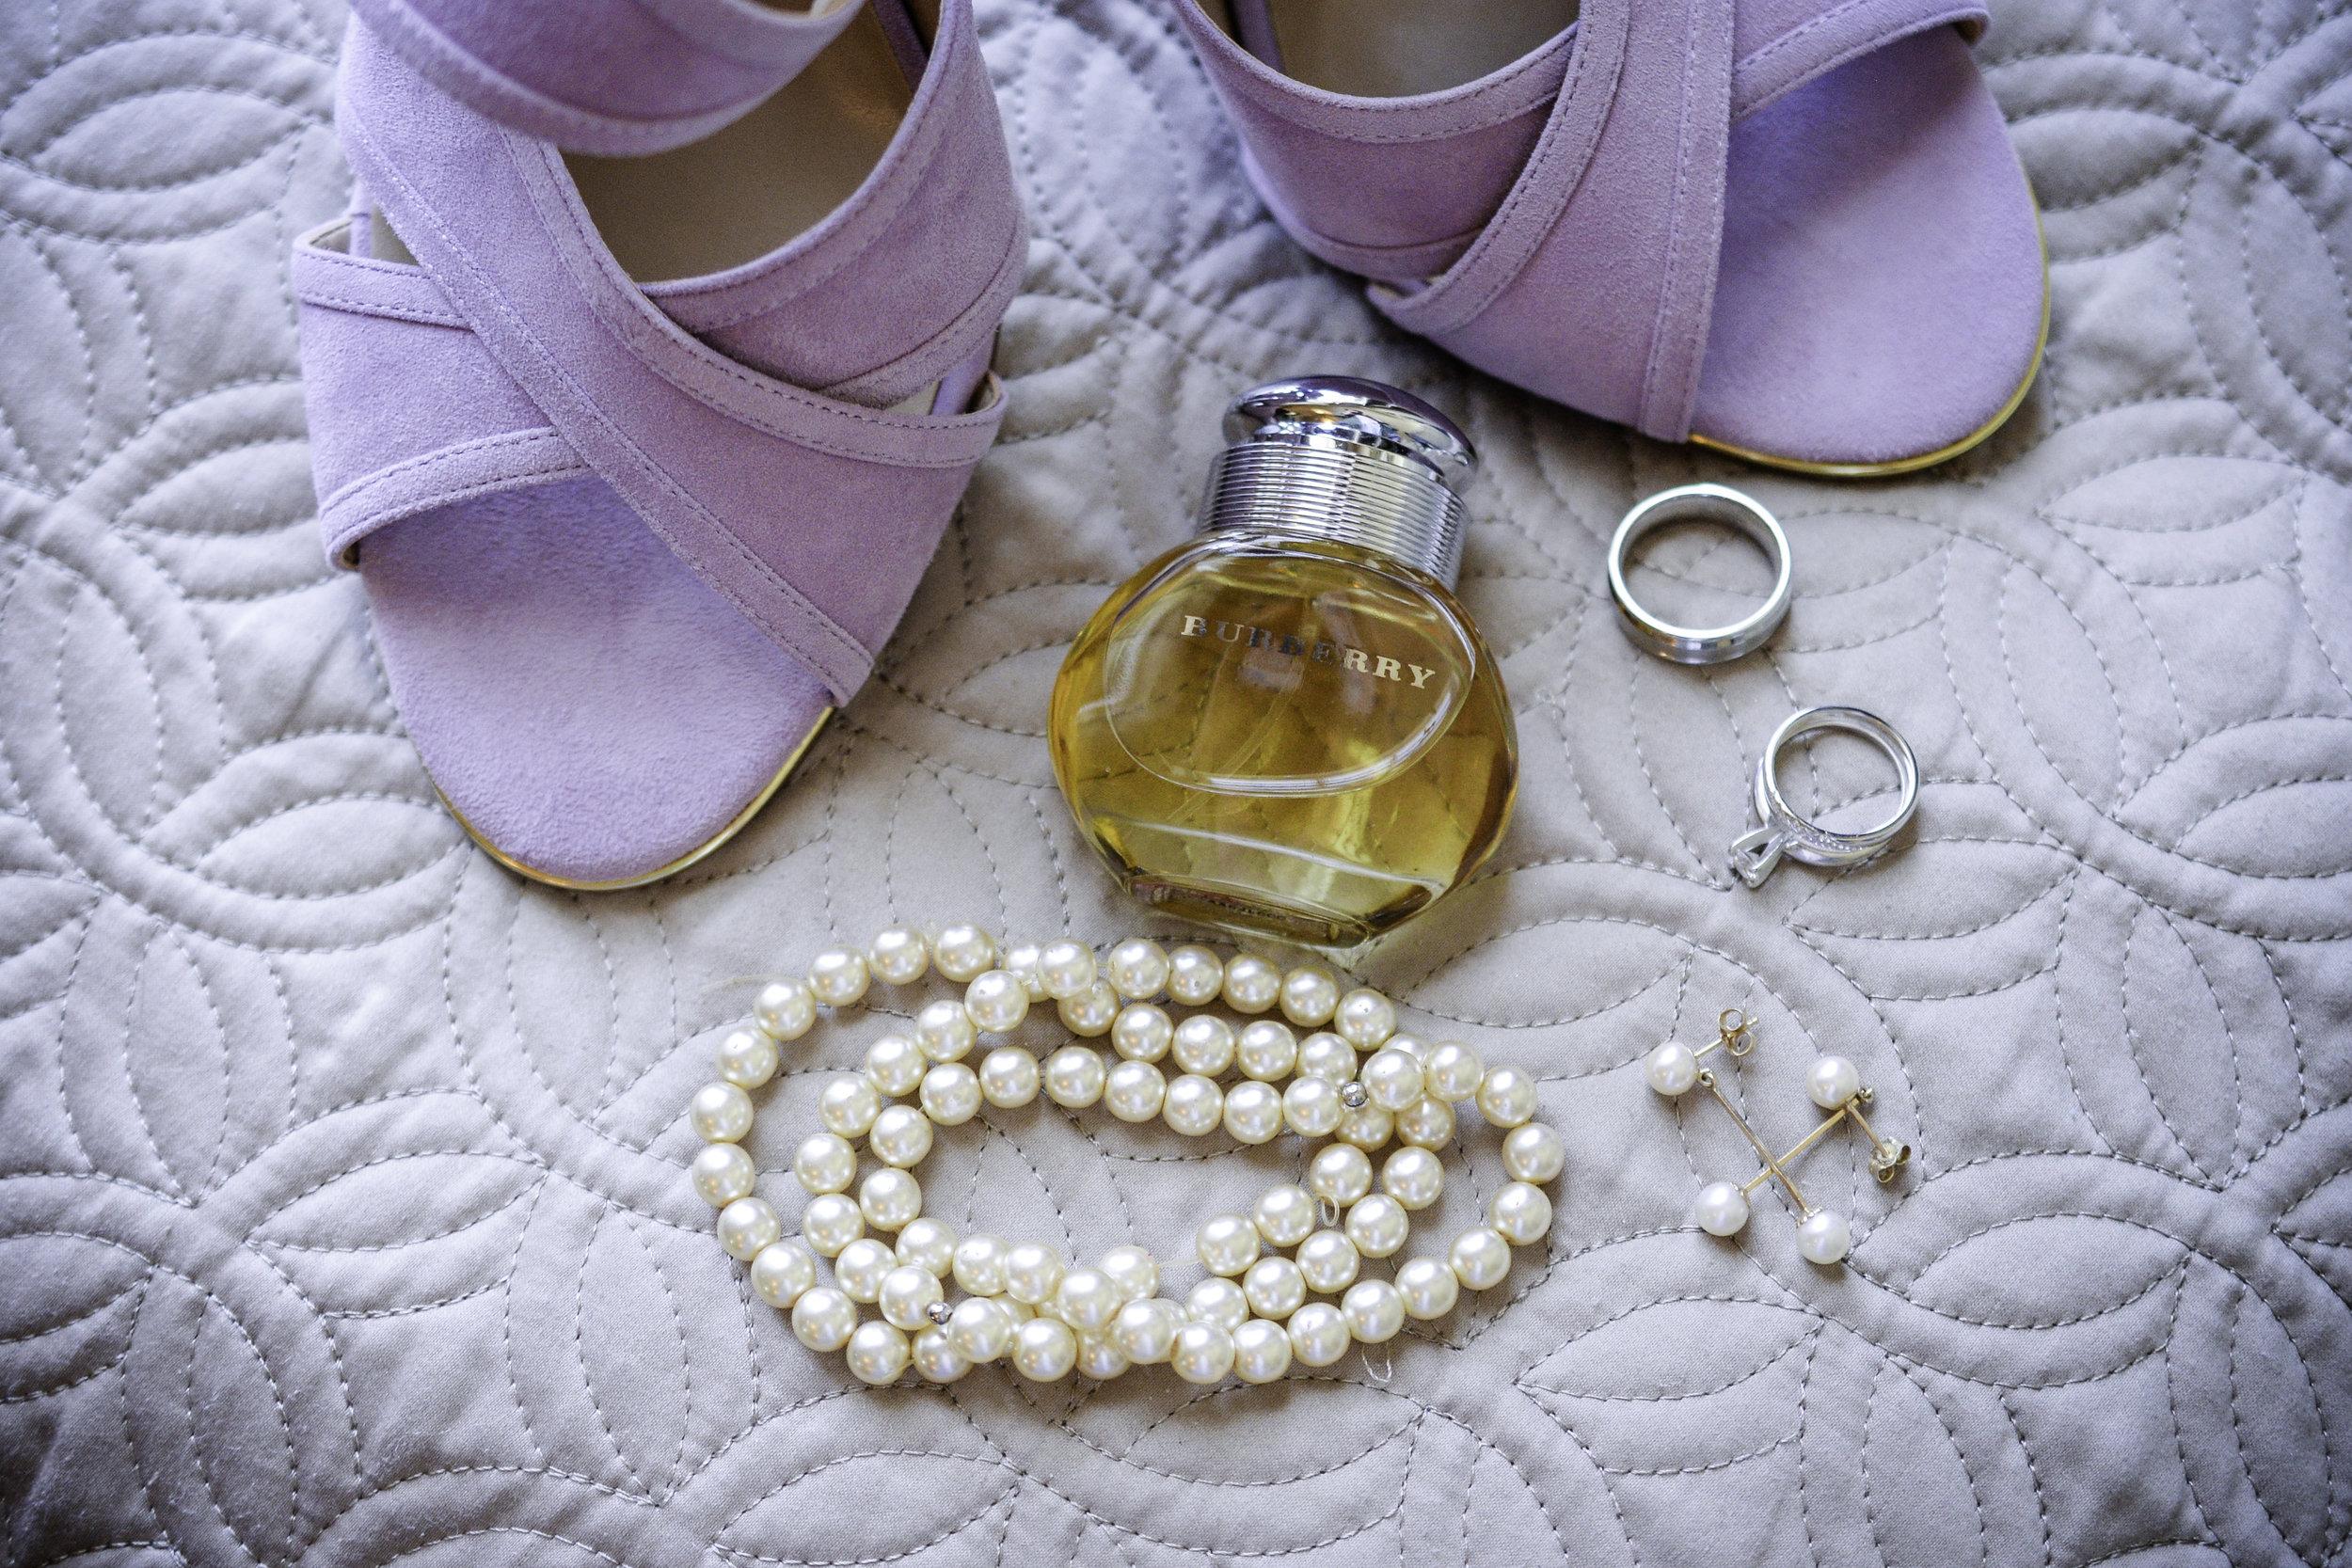 York Beach Maine Wedding.  Details.  Shoes Jewelry Wedding Rings  Burberry Perfume